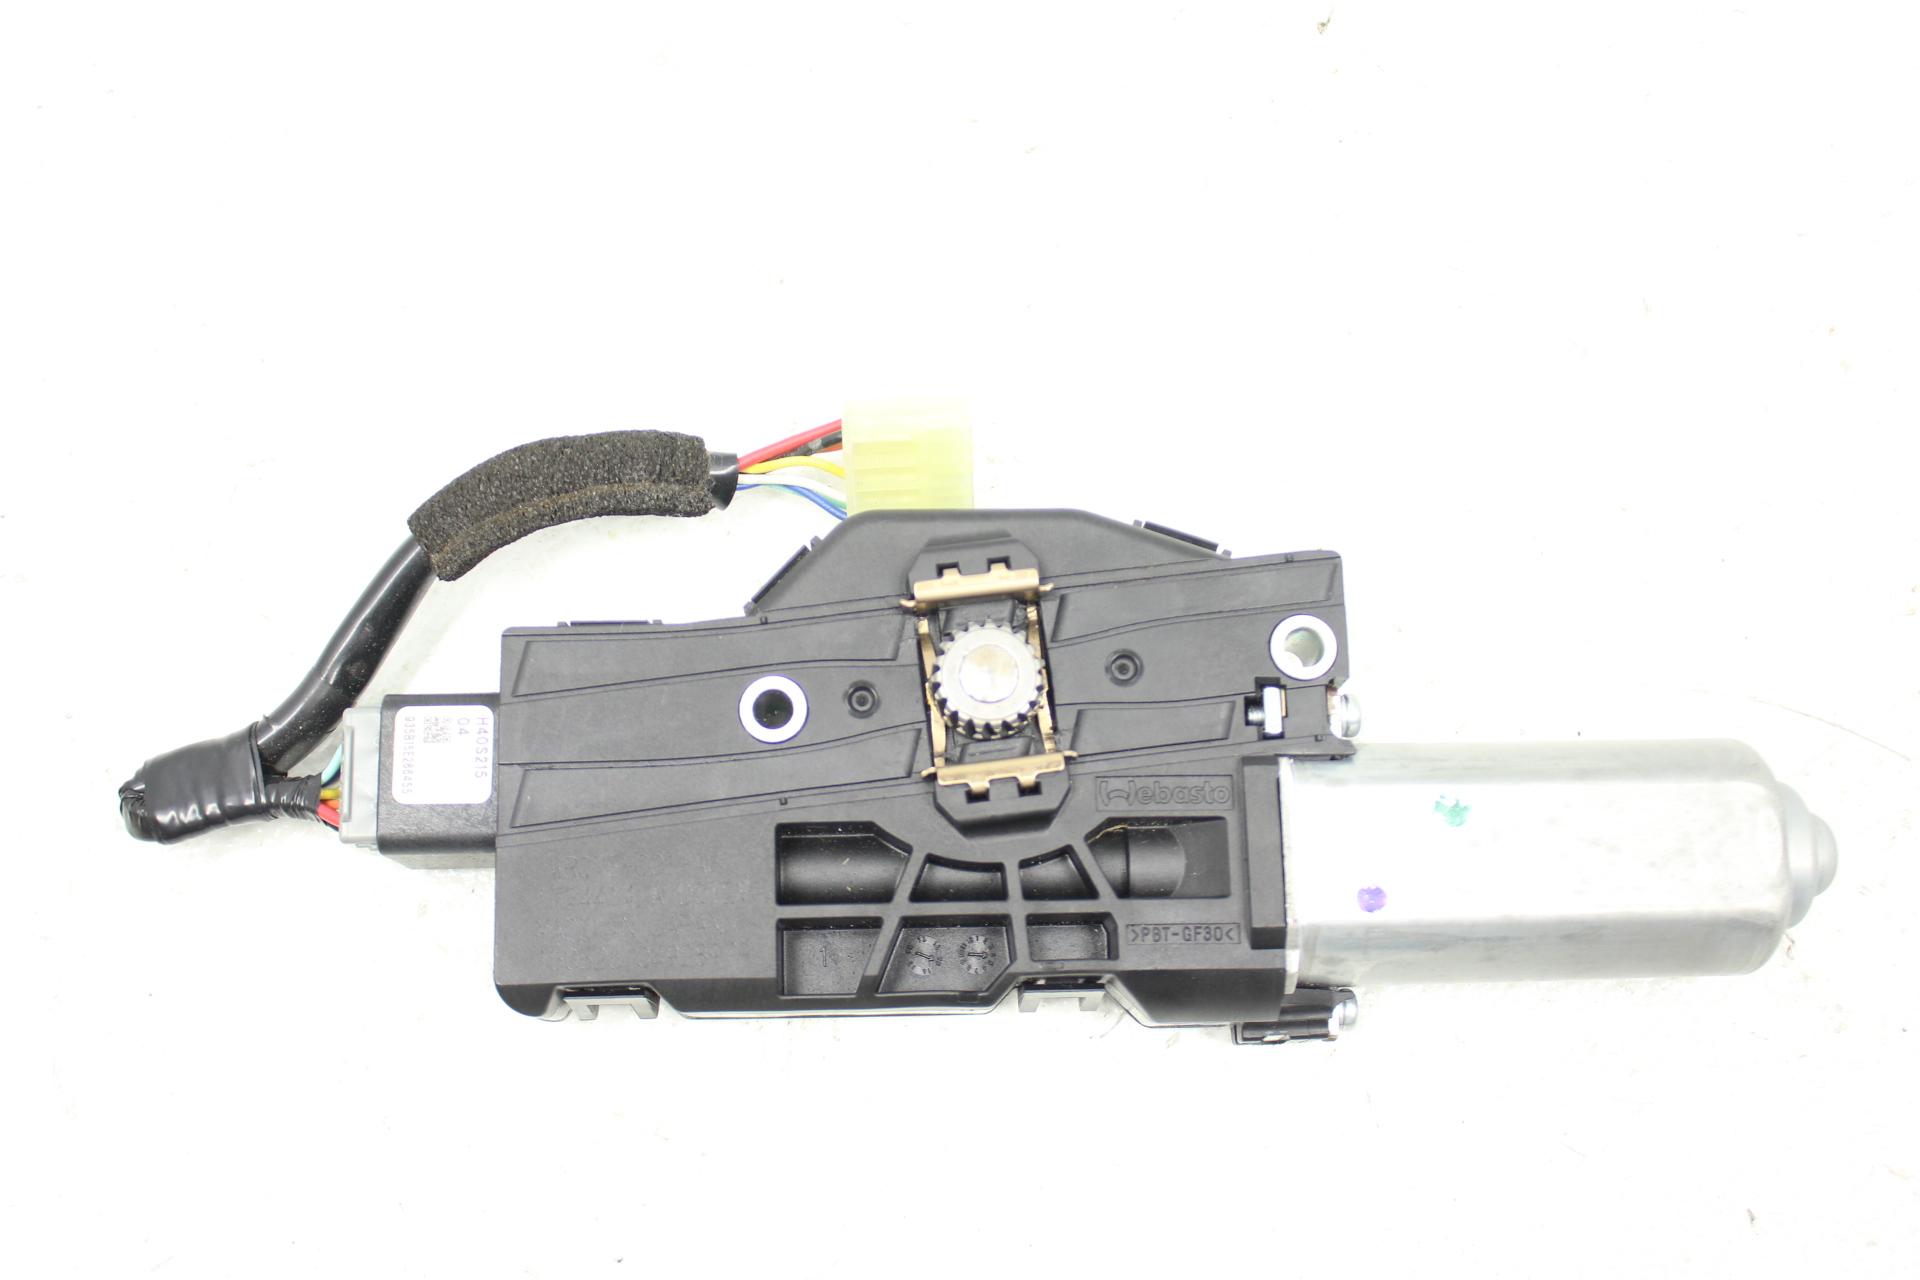 2015-2020 subaru wrx & sti sunroof motor assembly oem